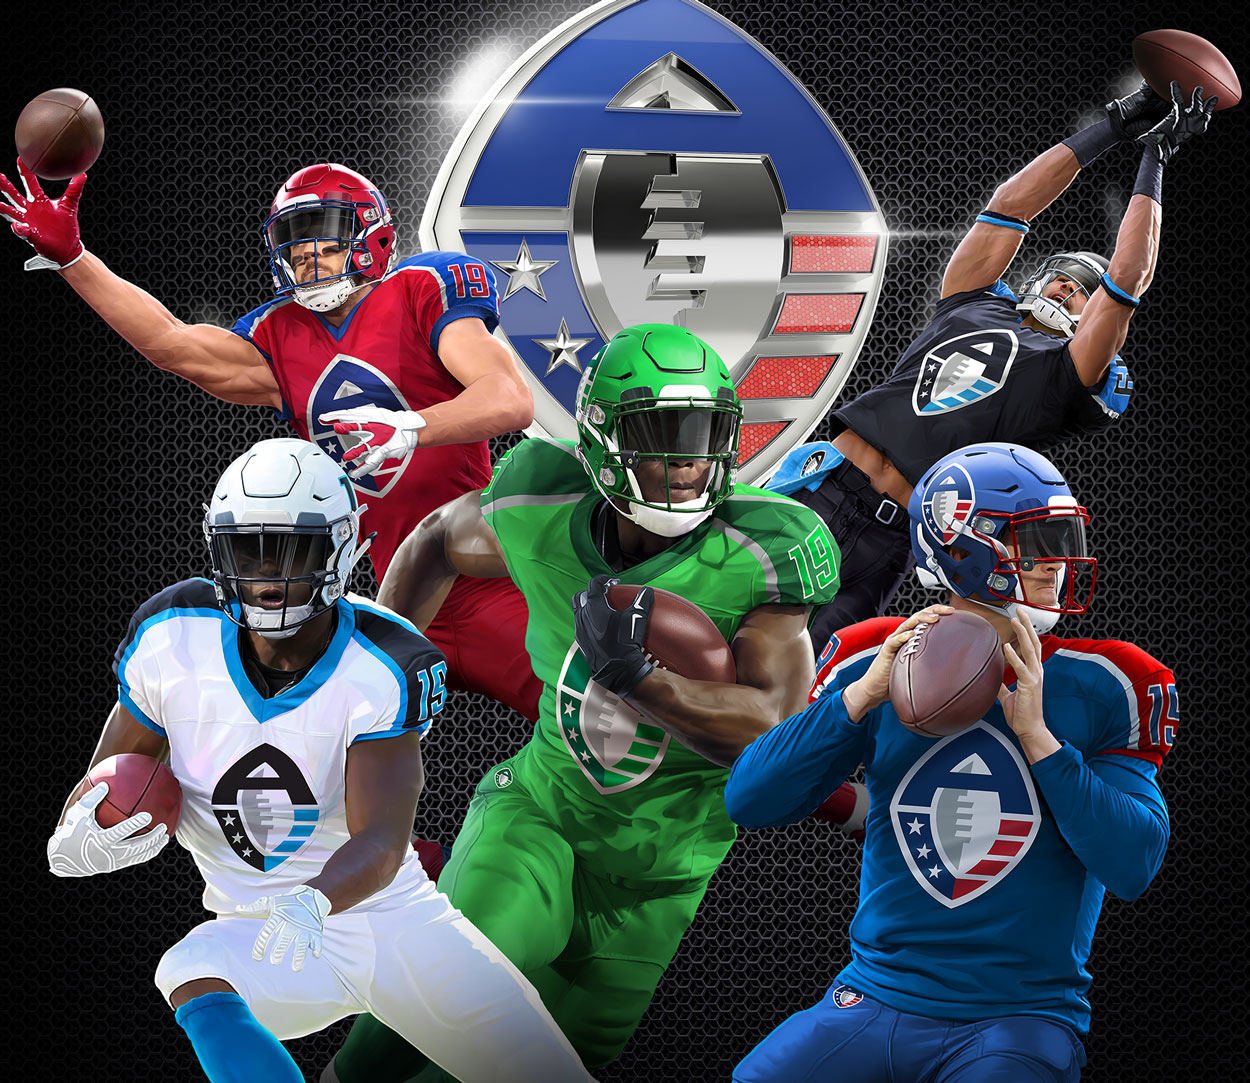 2019 AAF, 2020 XFL, le alternative alla NFL